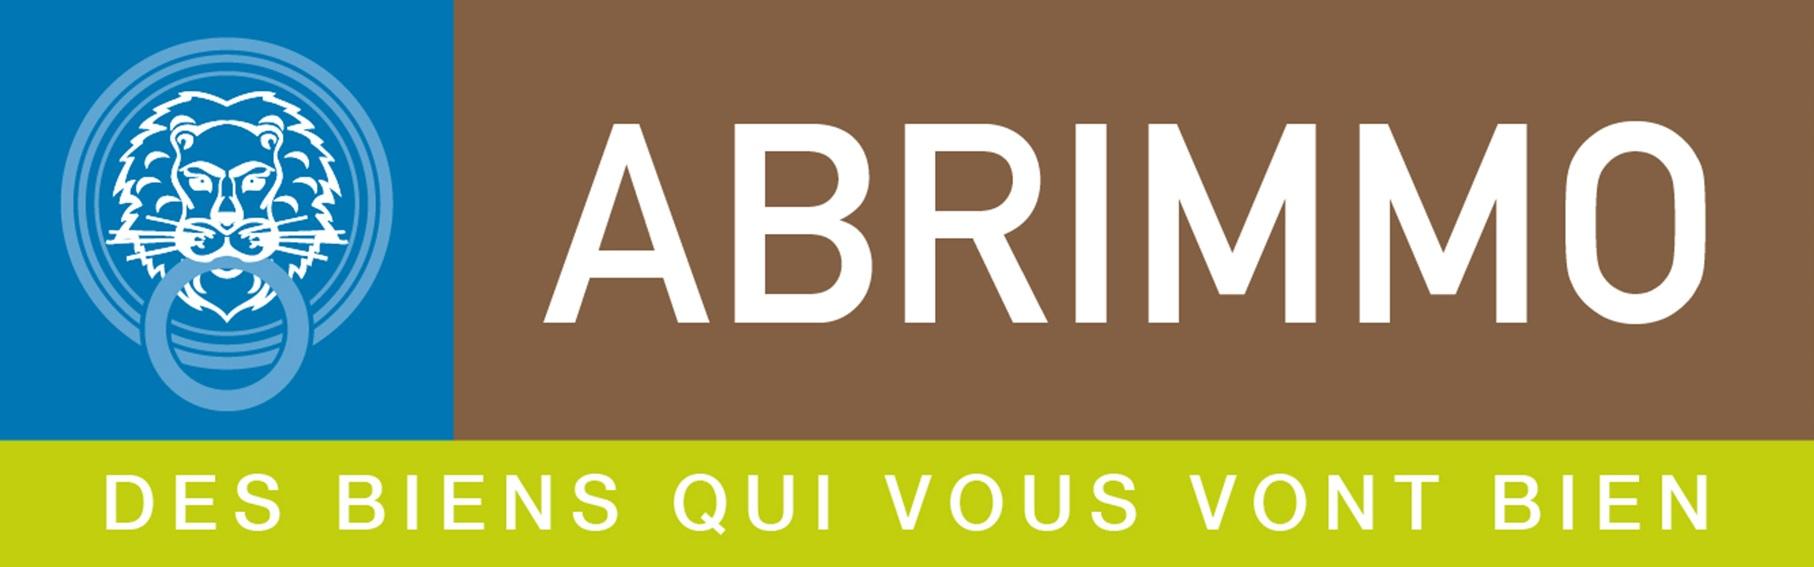 ABRIMMO HENIN BEAUMONT agence immobilière Hénin-Beaumont (62110)